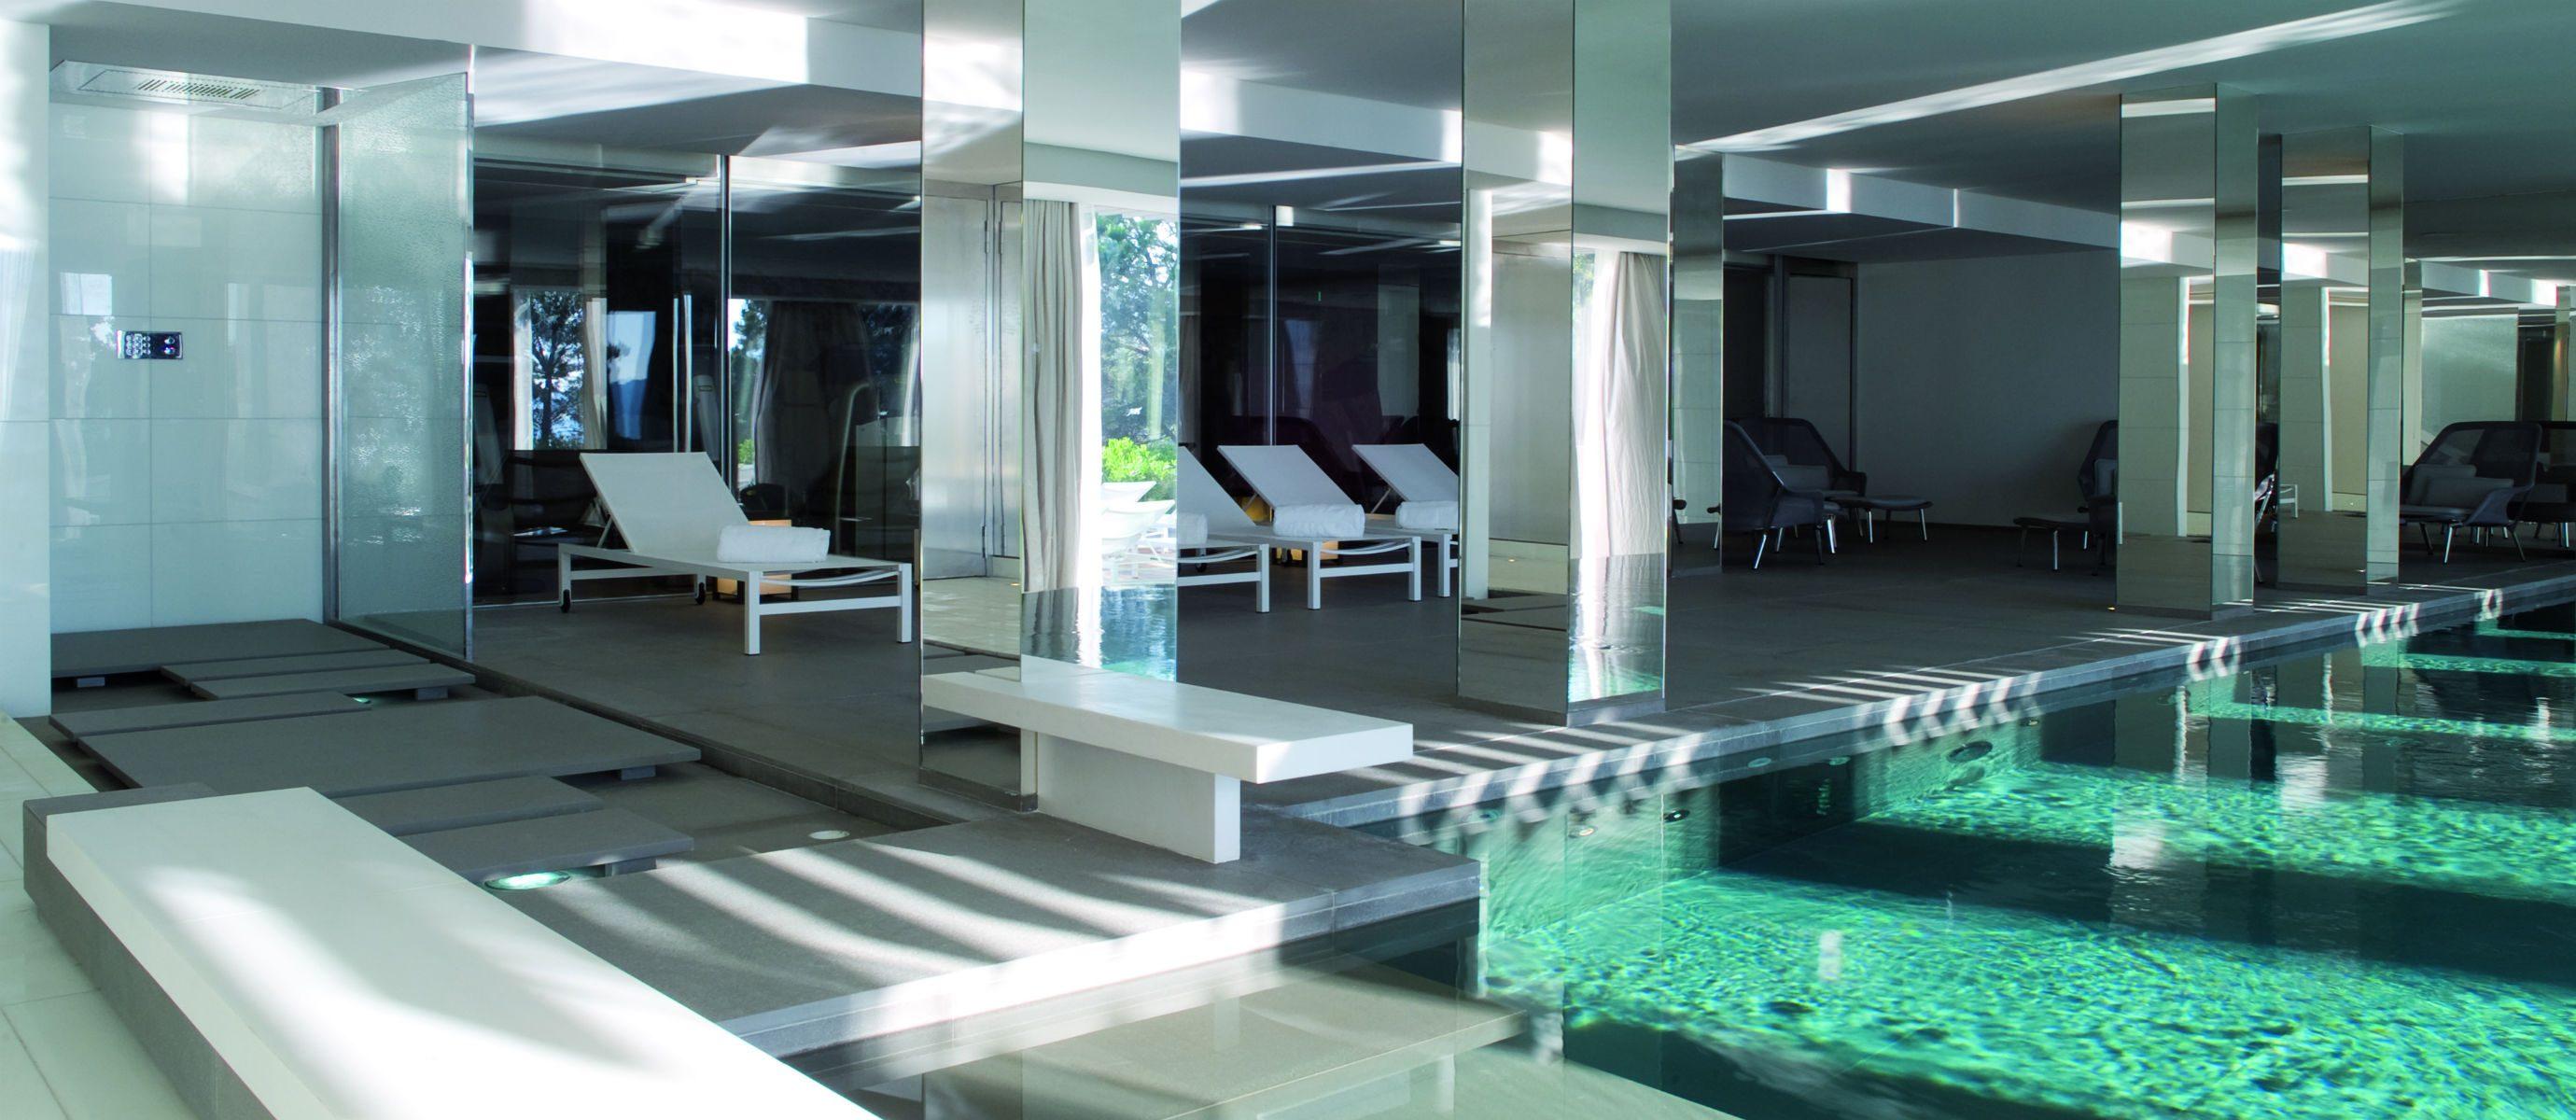 LARESERVE.Indoor Pool. MAIN